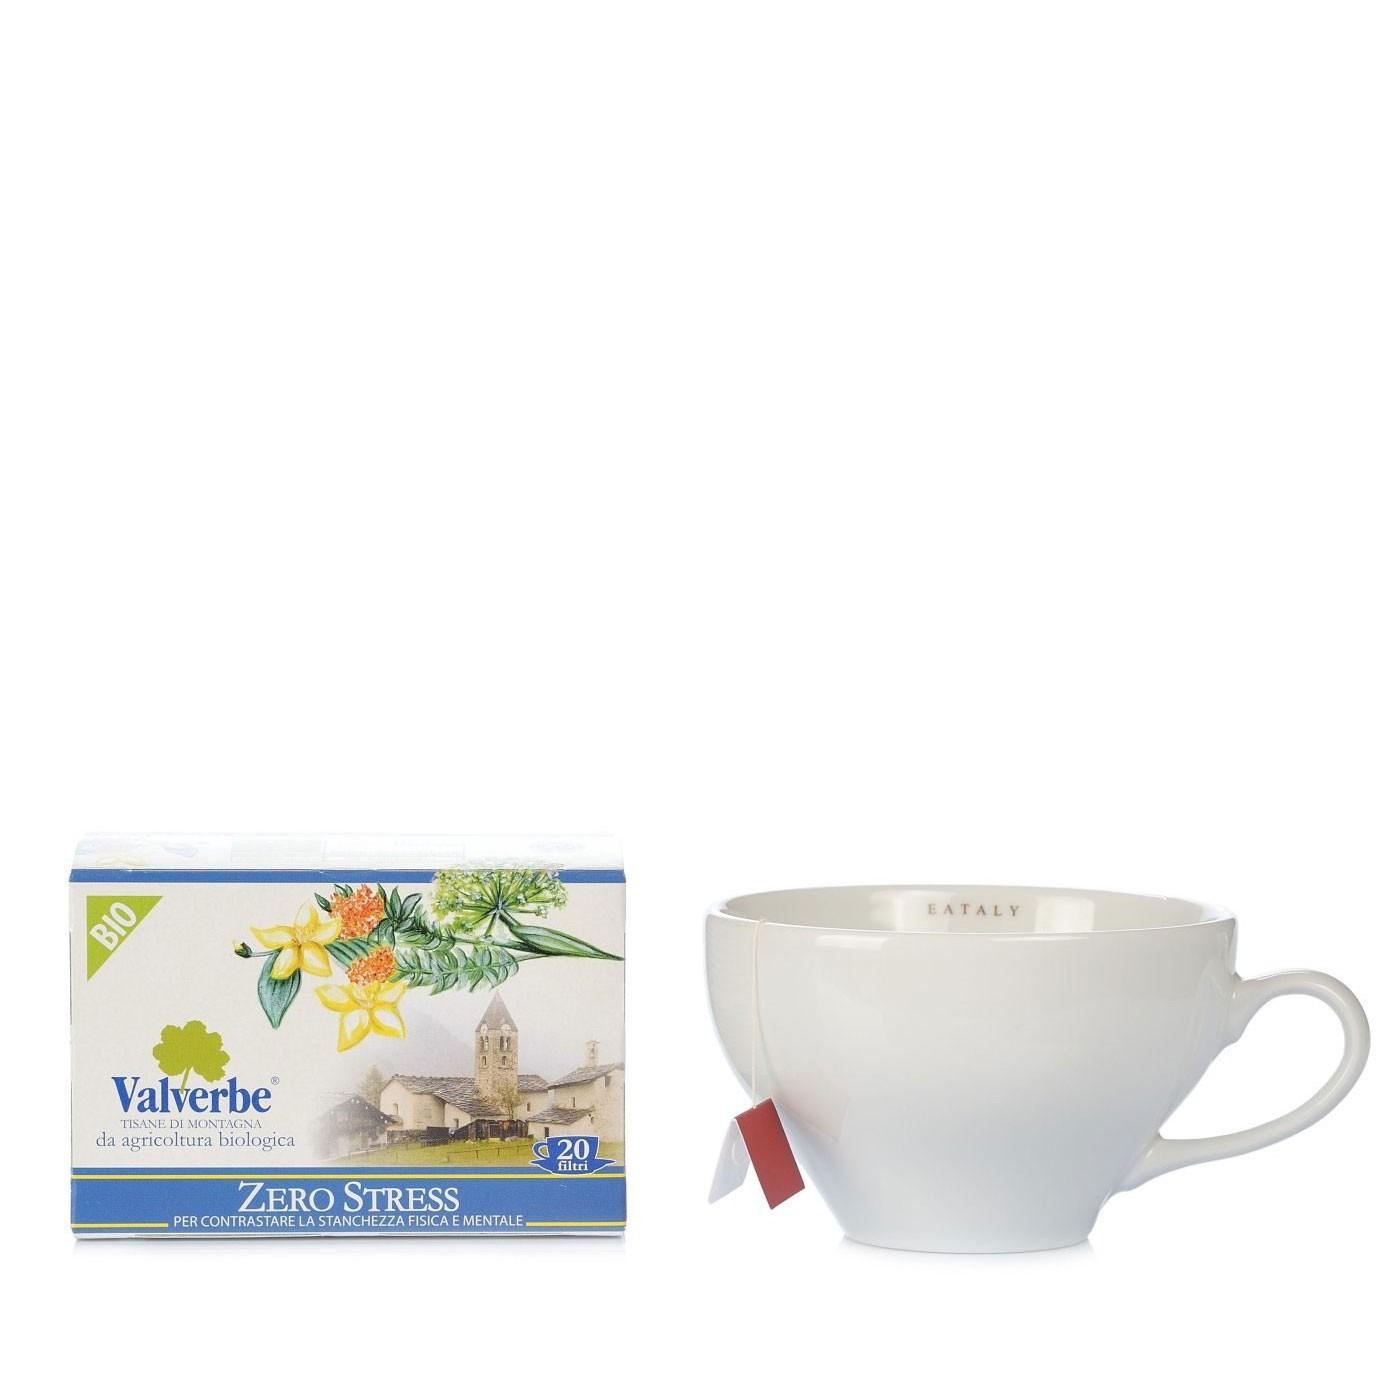 Zero Stress Herbal Infusion Tea 20 Bags